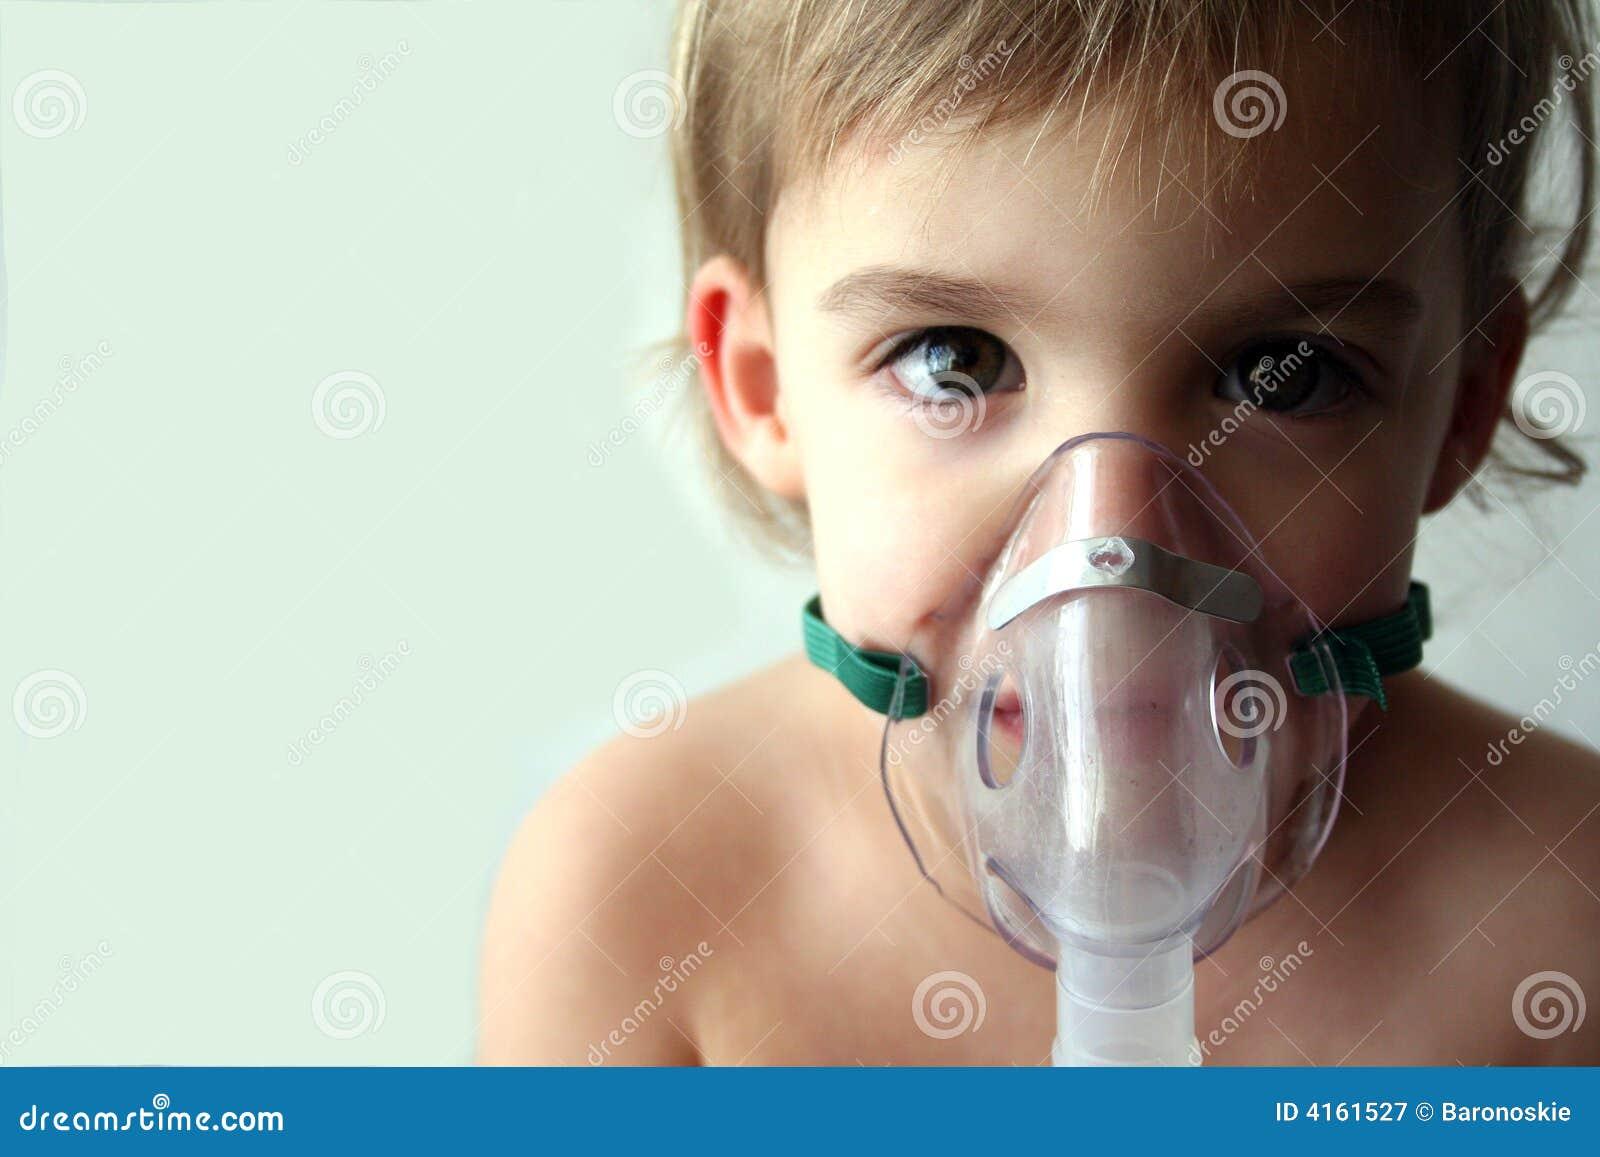 pediatric nebulizer treatment 3 stock image